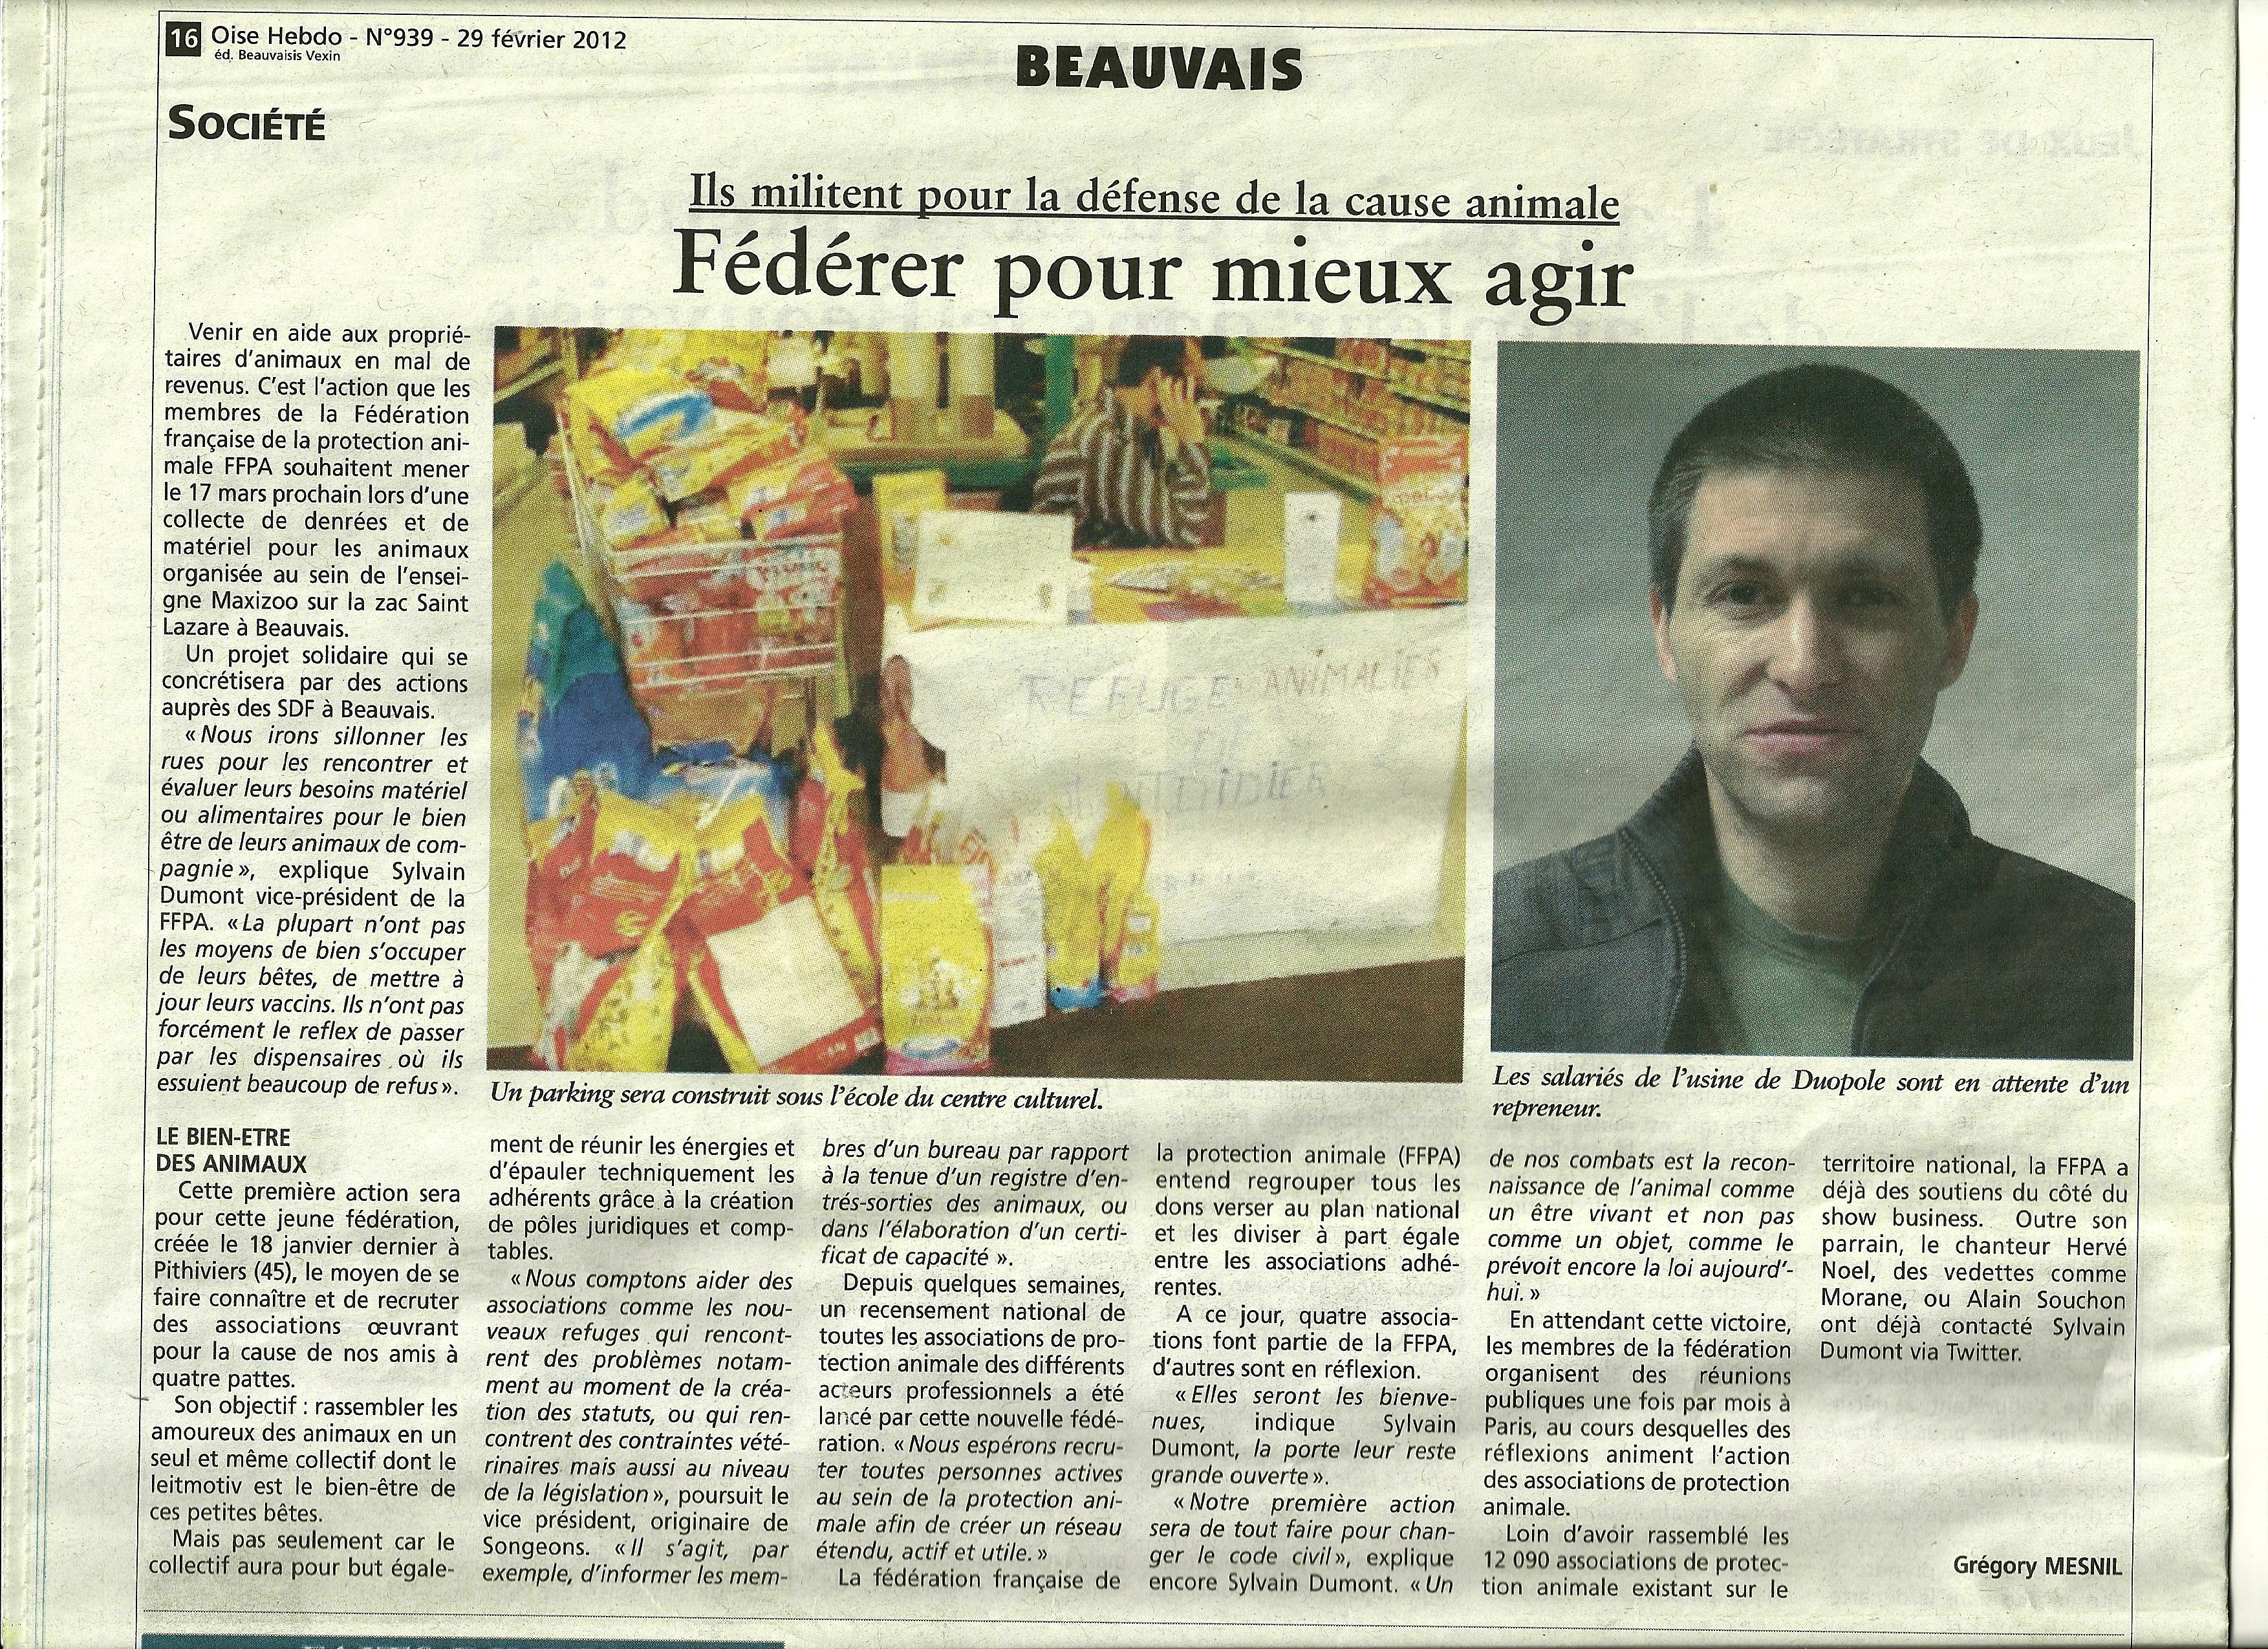 FFPA ARTICLE OISE HEBDO DU 29 02 20120001